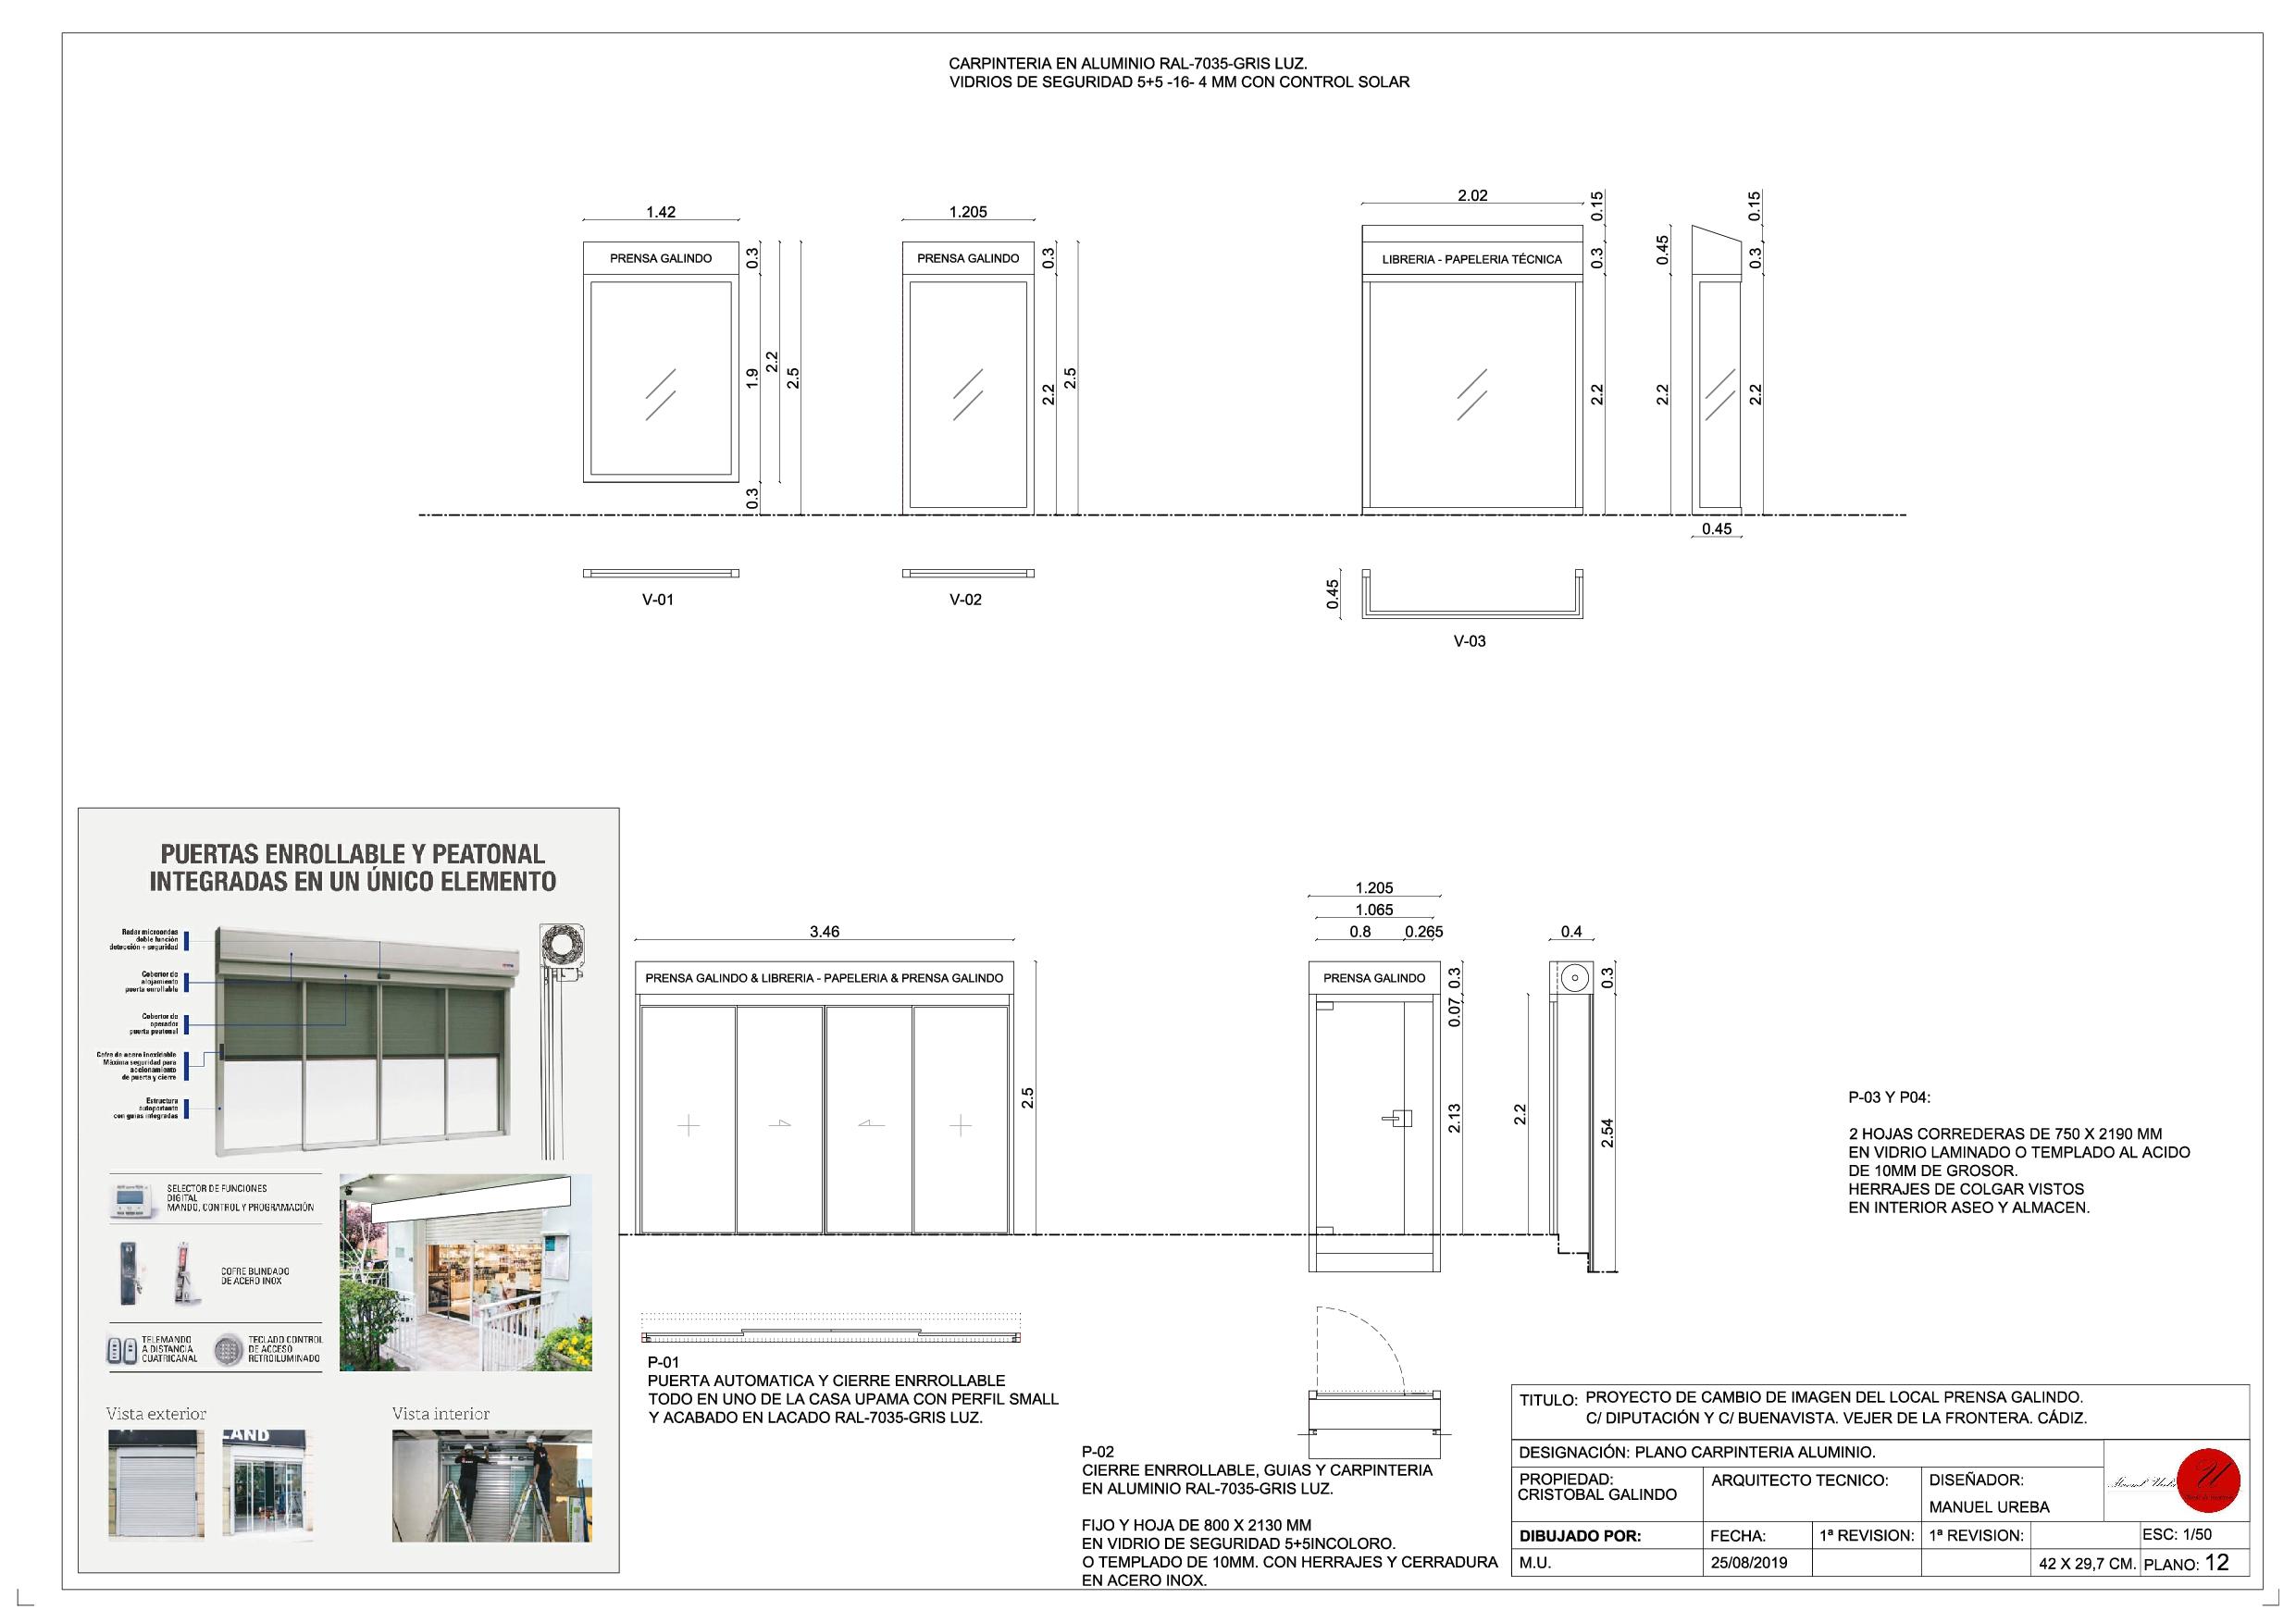 I. PROYECTO PDF PRENSA GALINDO. PLANOS